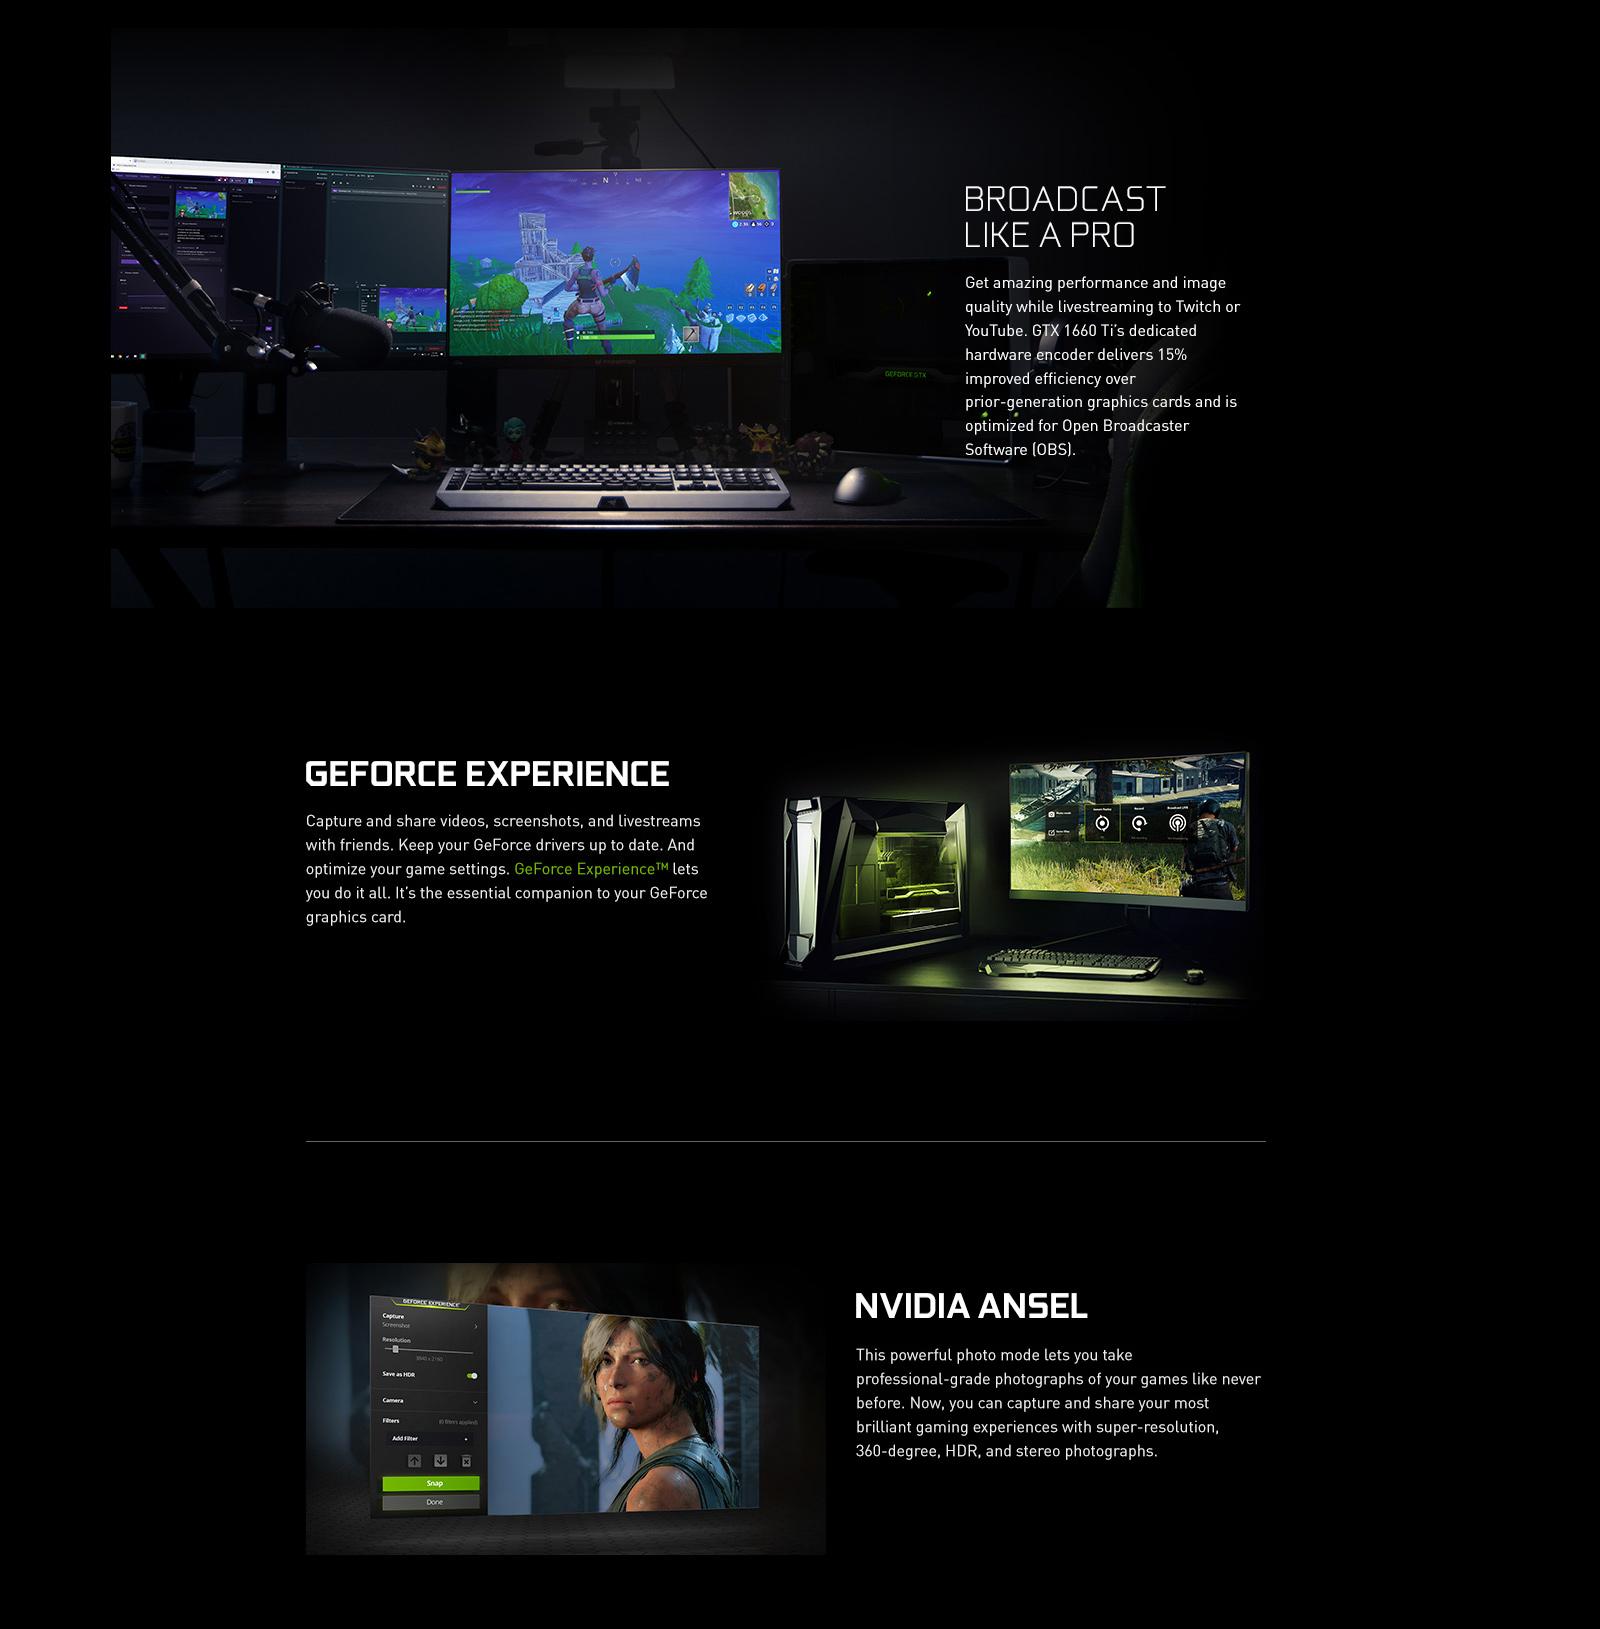 NVIDIA-GTX-1660Ti: iBUYPOWER®